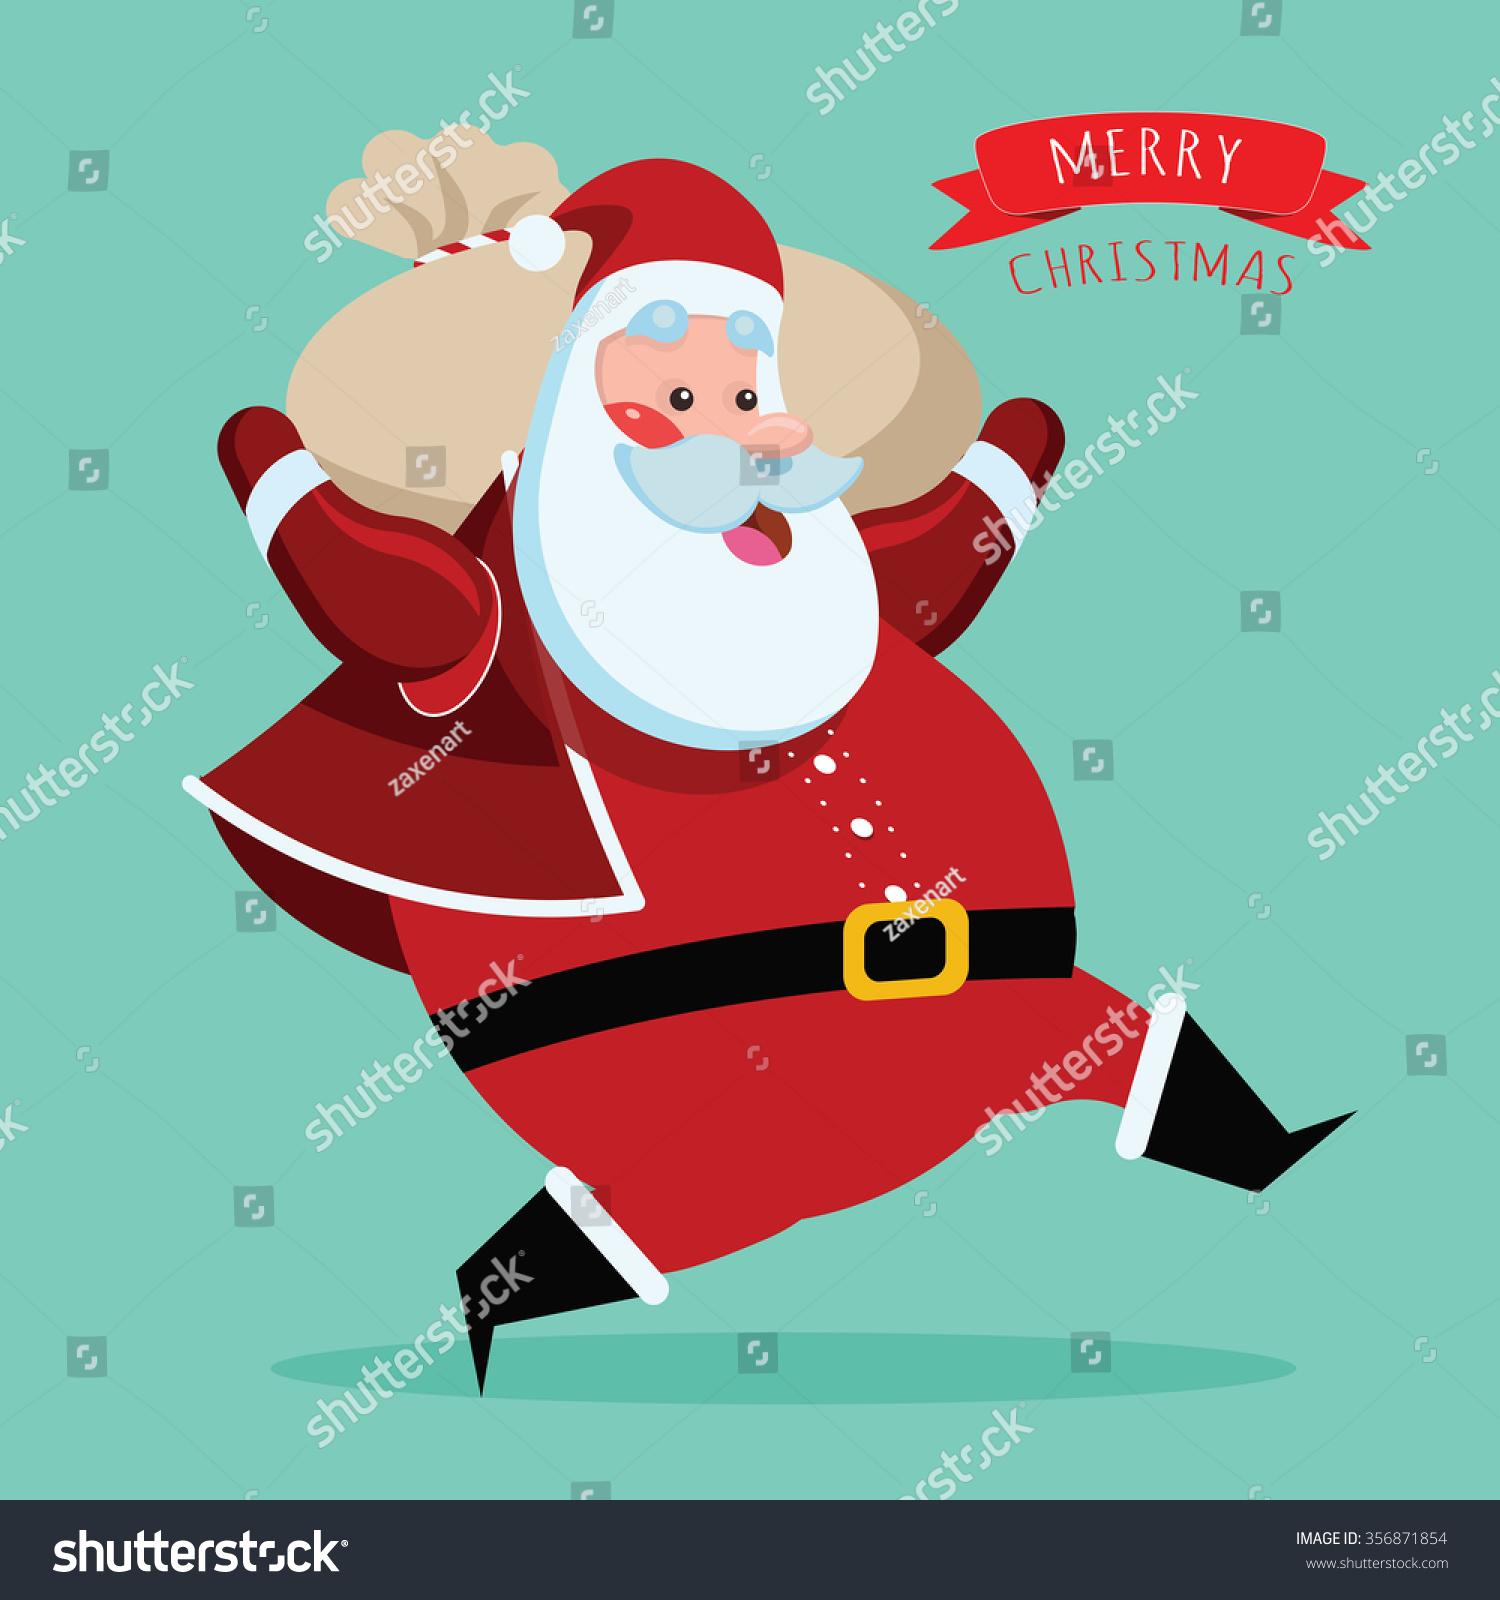 Santa Christmas Run Stock Illustration 356871854 - Shutterstock